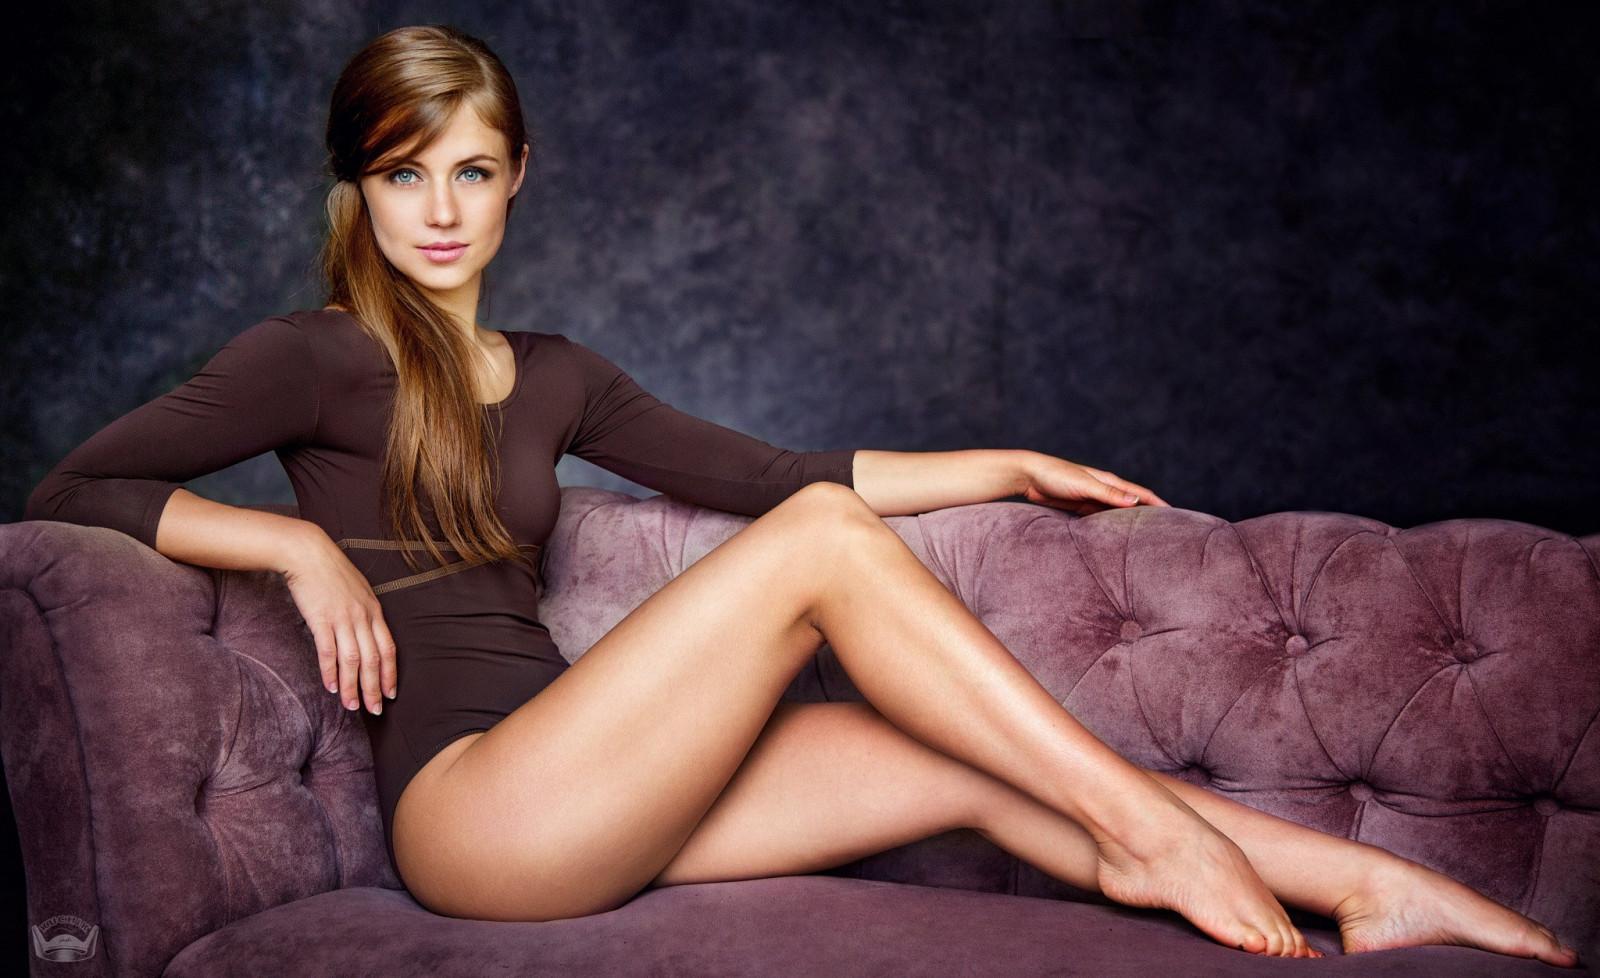 girls-legs-pics-naked-suicide-girls-cum